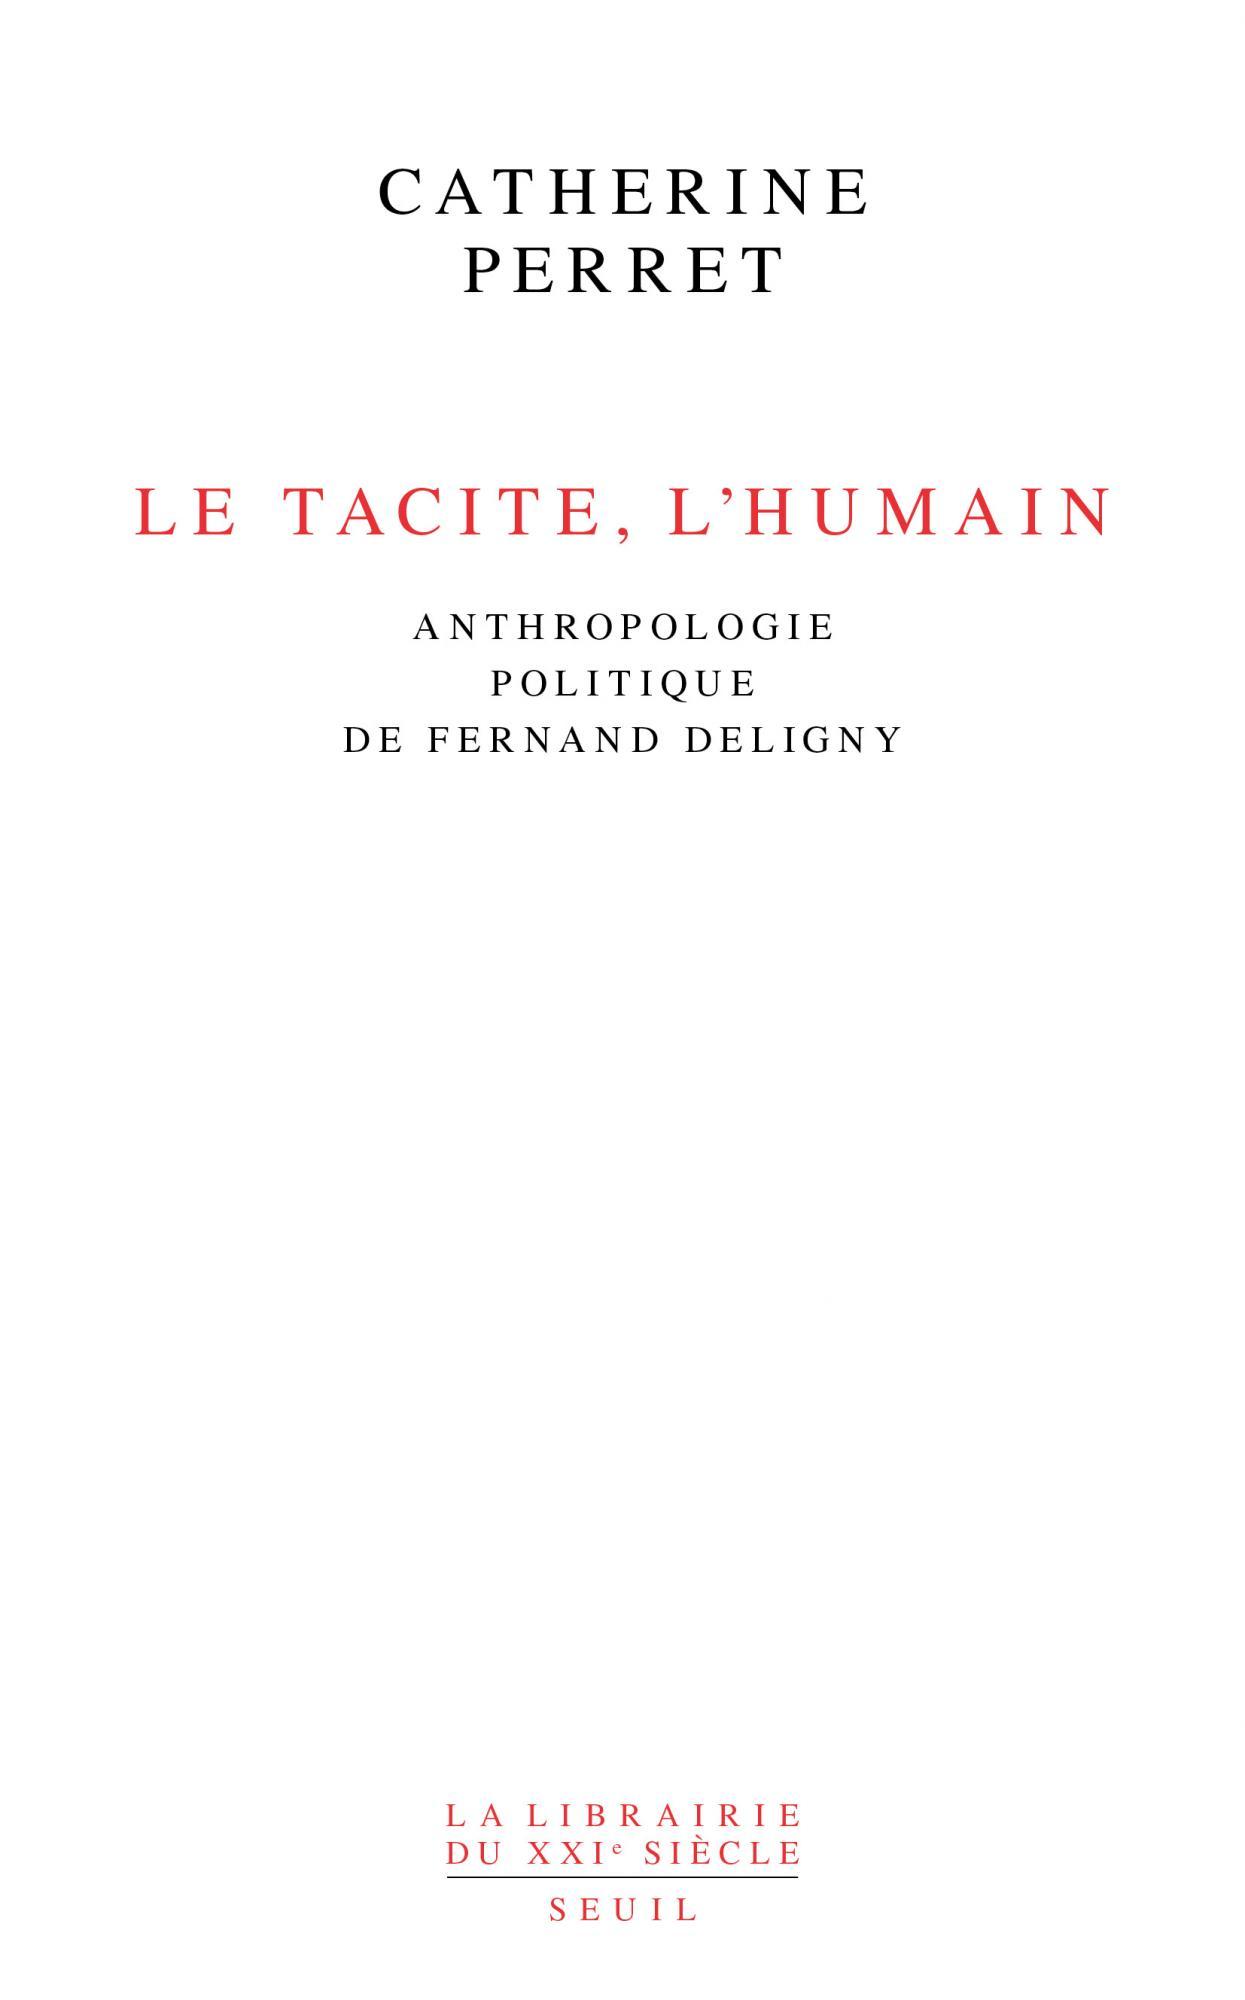 C. Perret, Le Tacite, l'humain. Anthropologie politique de Fernand Deligny